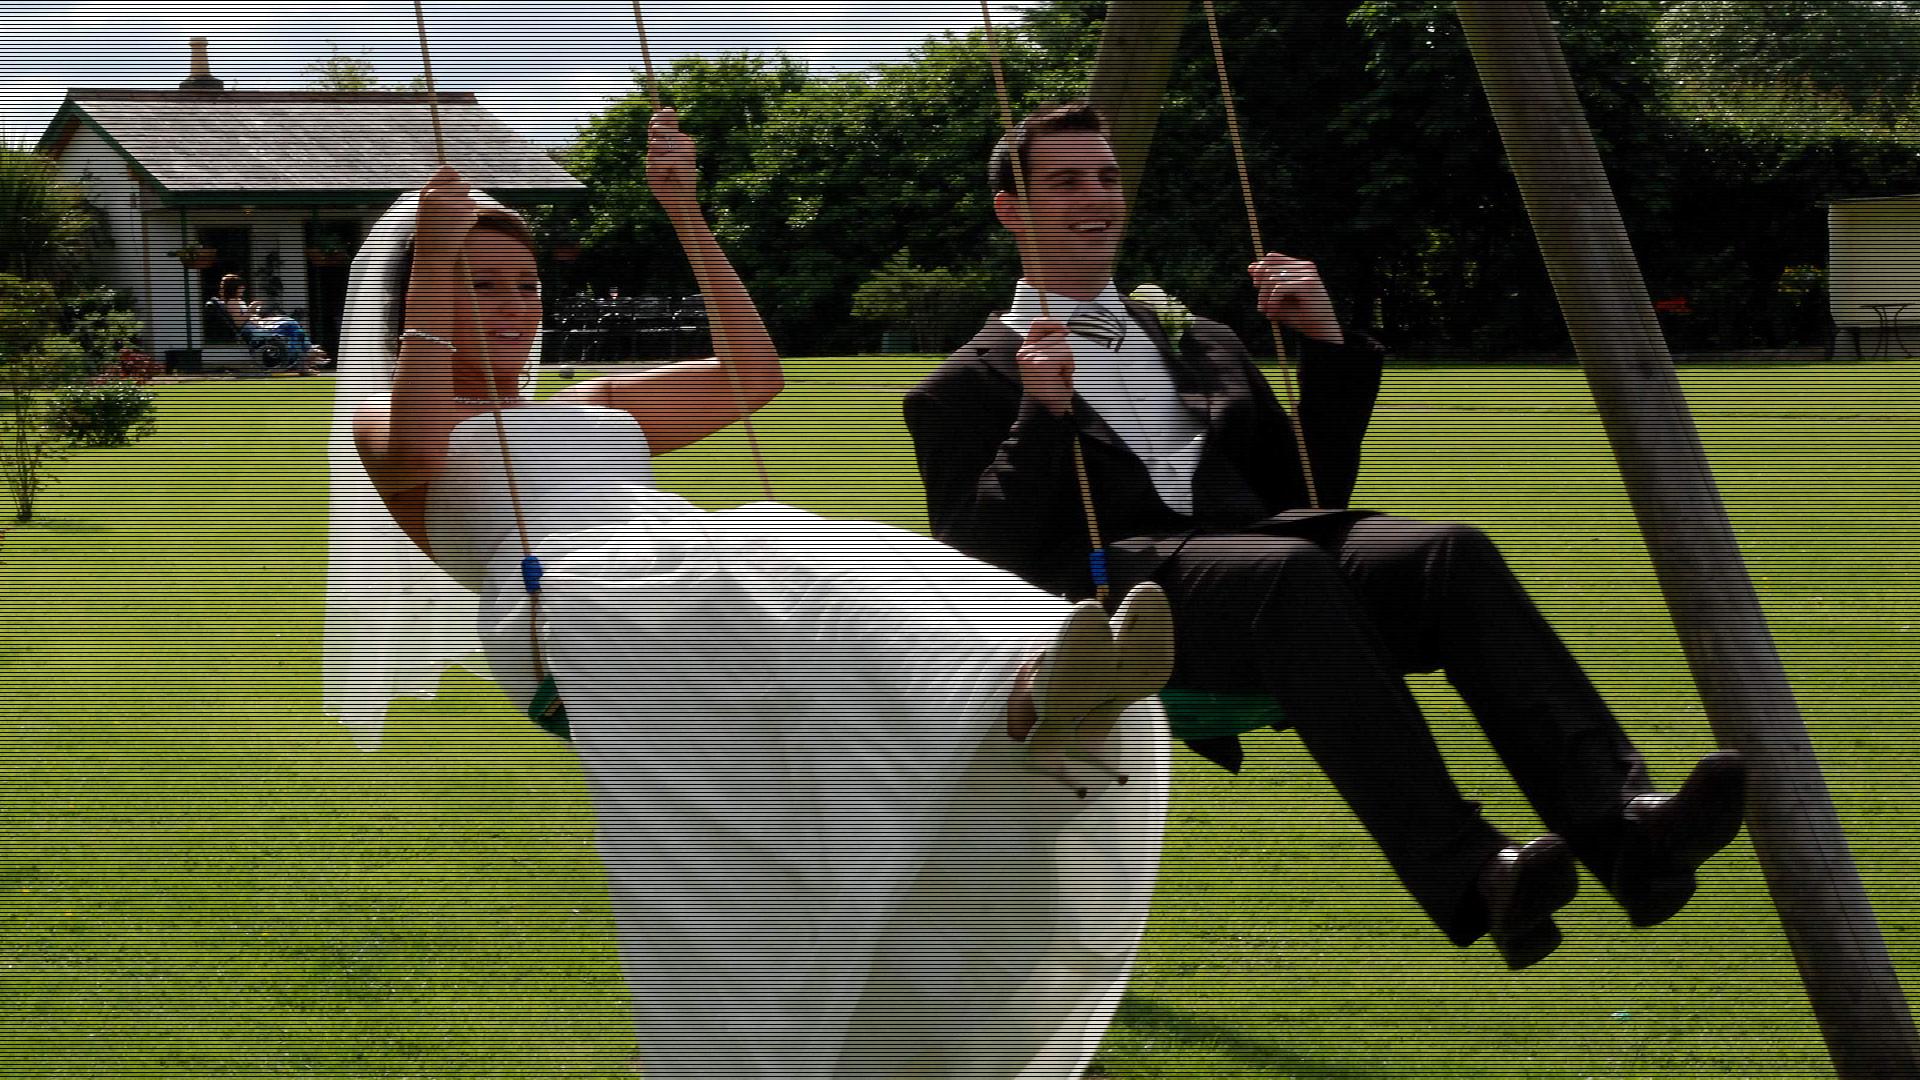 Wedding Venue - Weddings at The Shepherds Rest Pub